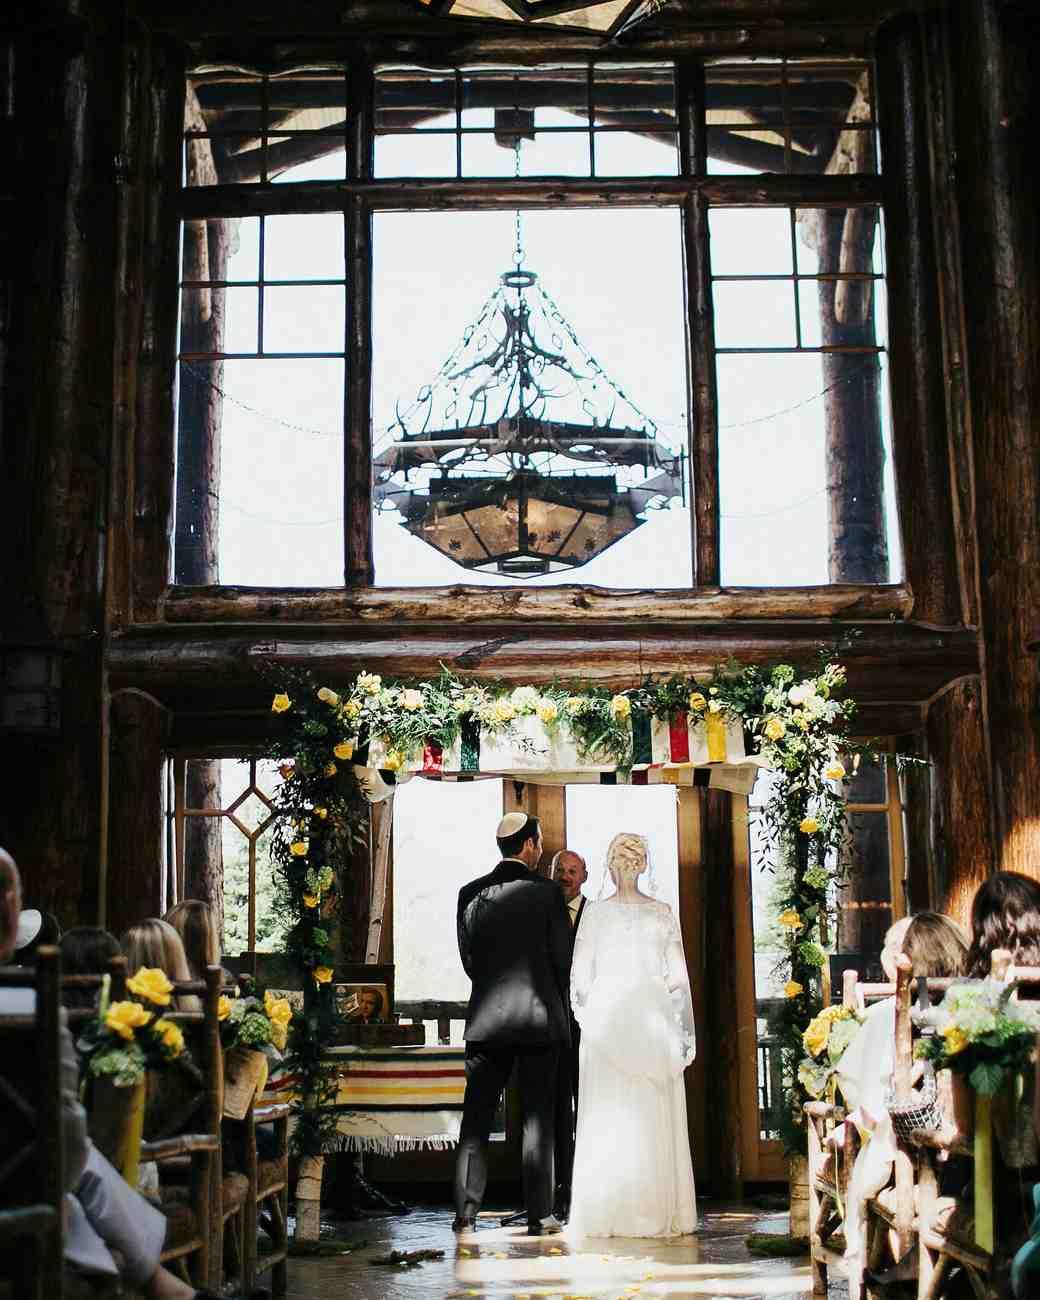 ryan-alan-wedding-ceremony-09-0590-s112966-0516.jpg